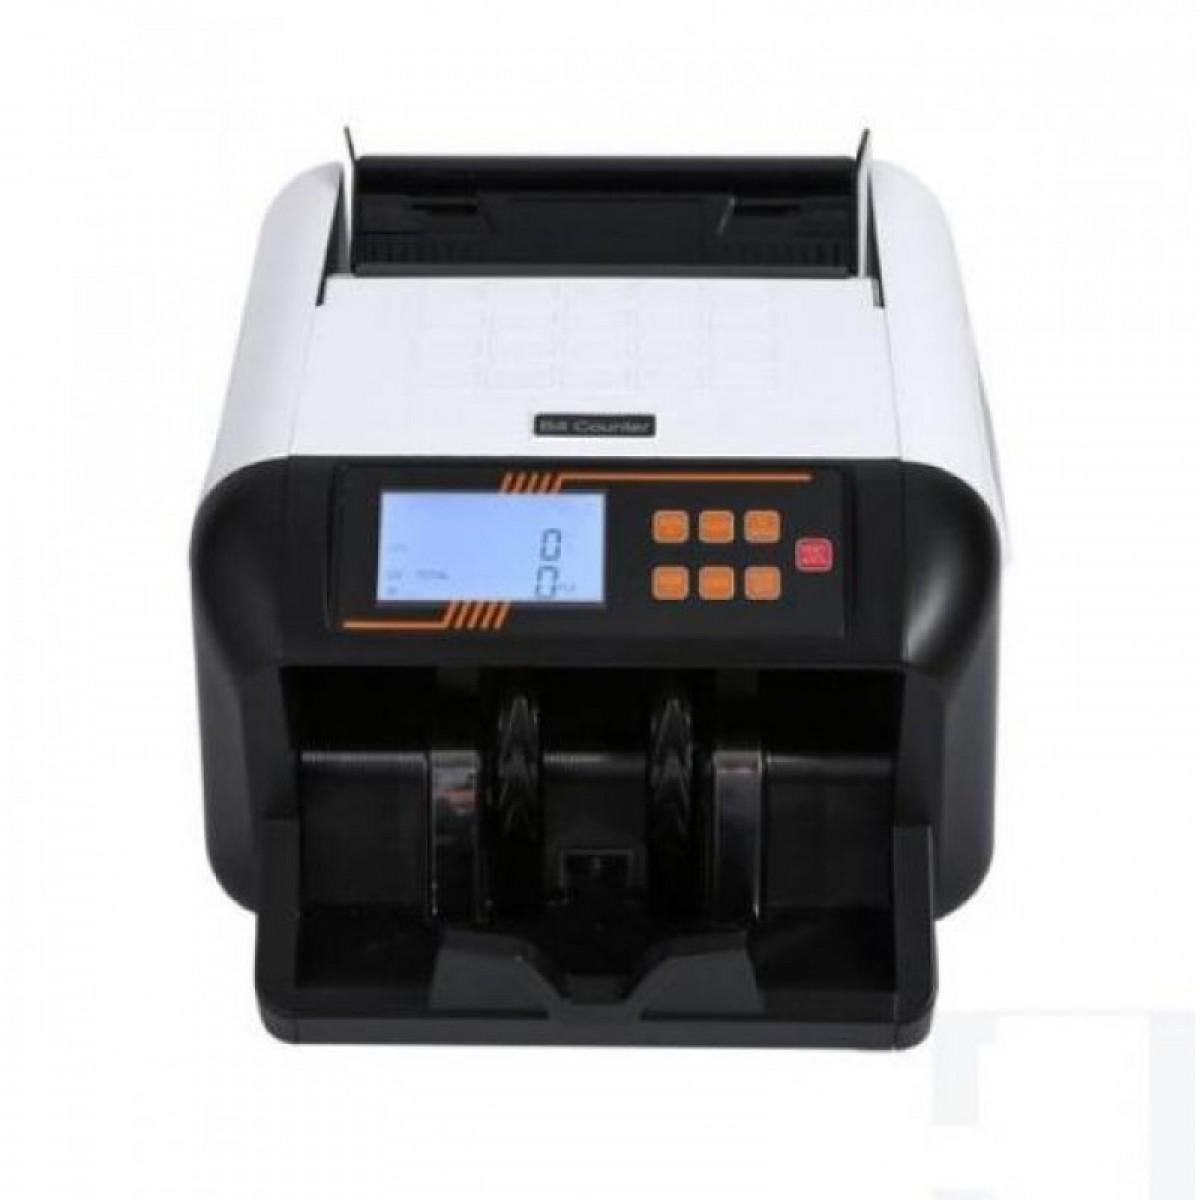 Bill counter 555C Μετρητής και Ανιχνευτής Πλαστών Χαρτονομισμάτων